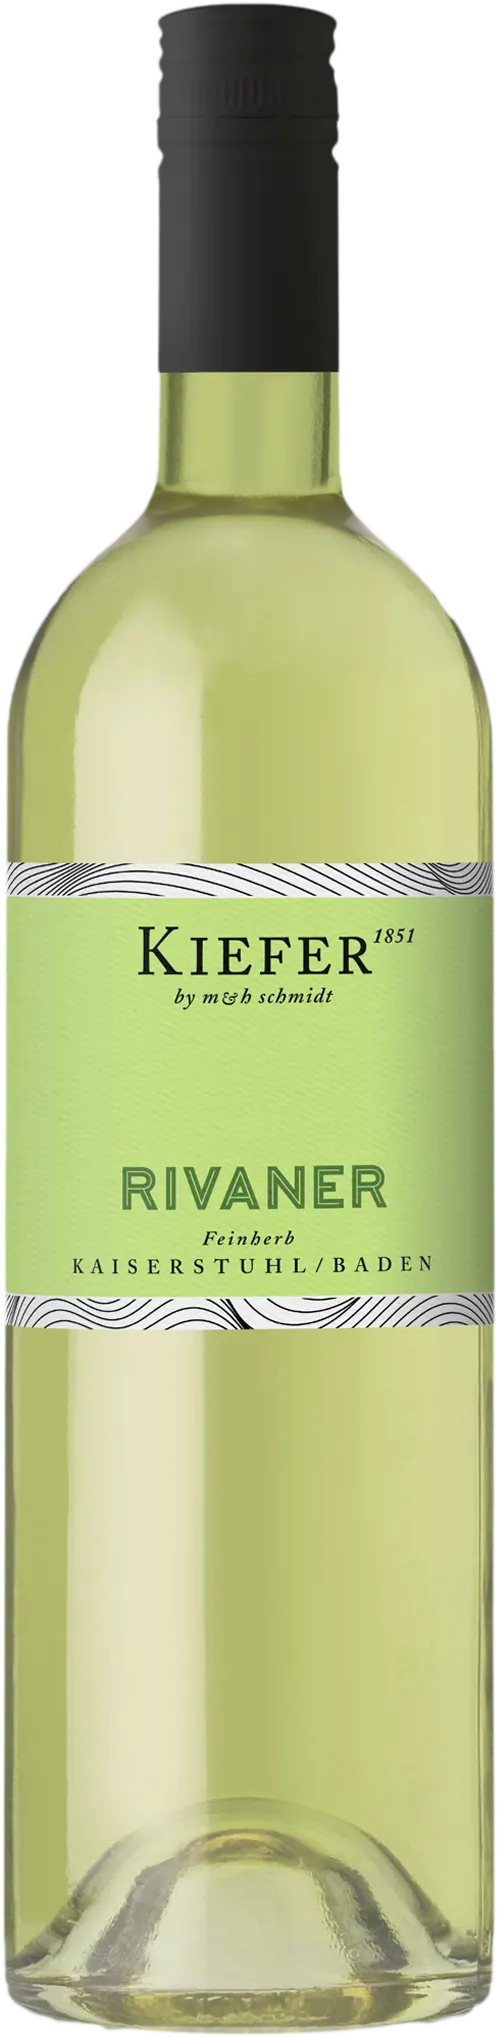 Rivaner | Kiefer | 2019